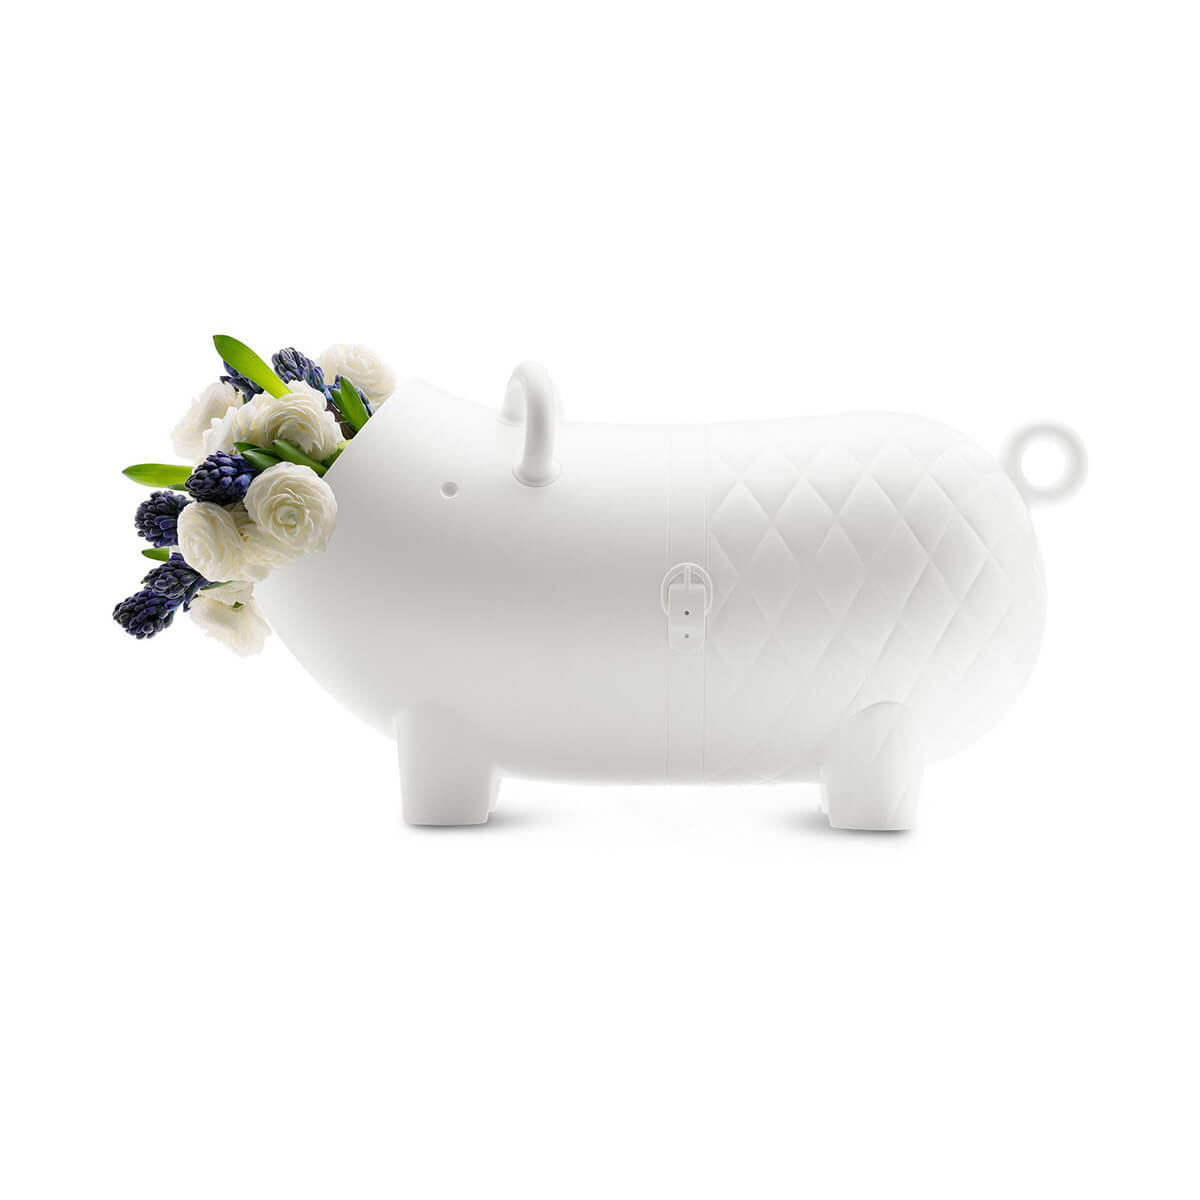 Cybex Wanders Hausschwein Свинка для хранения игрушек Cybex Wanders Hausschwein White 10030_6-Hausschwein-white.jpg